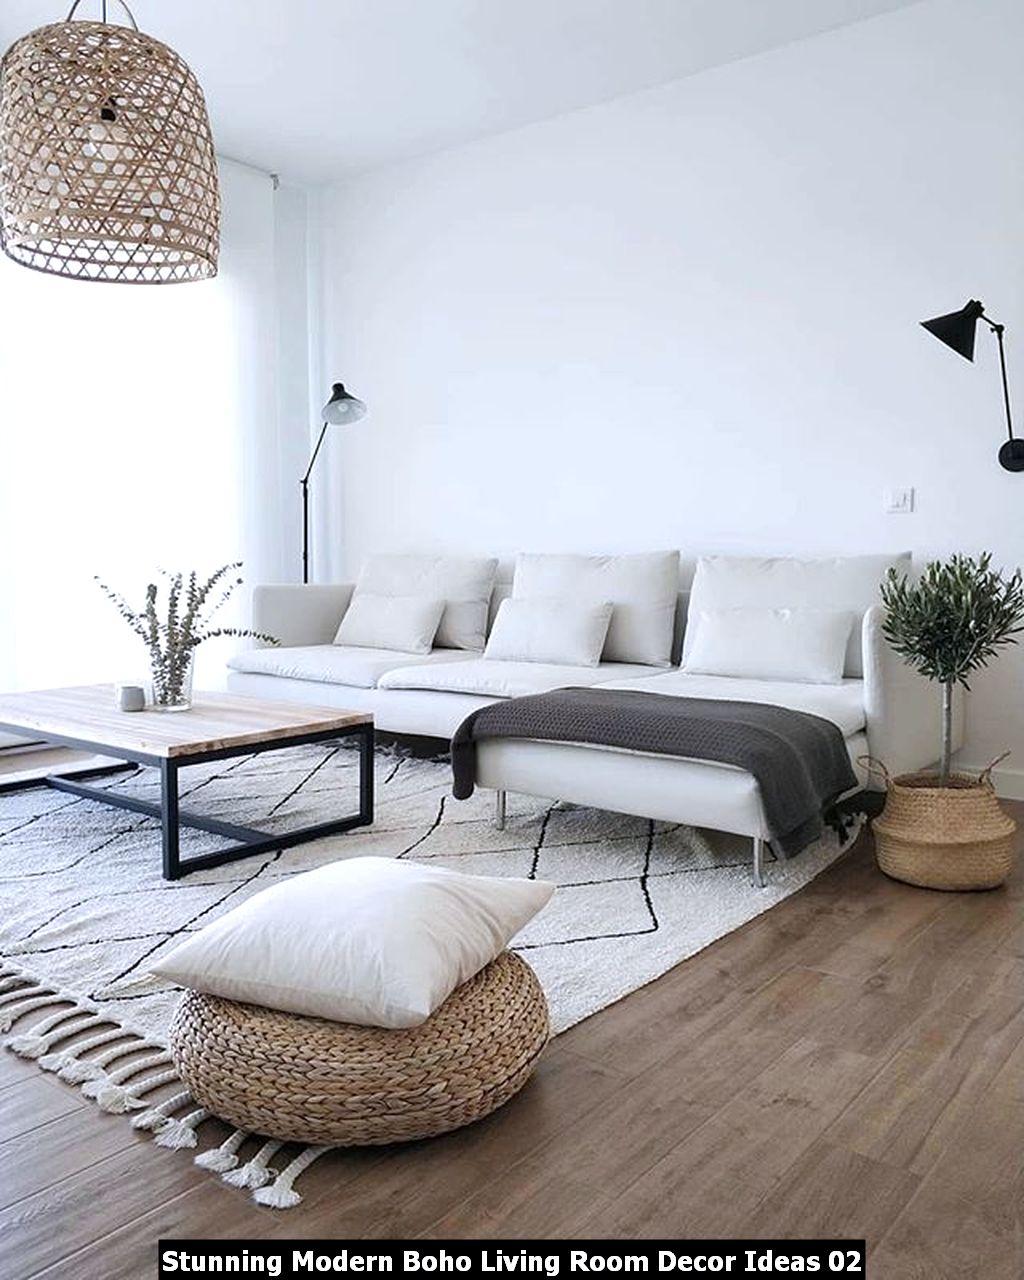 Stunning Modern Boho Living Room Decor Ideas 02